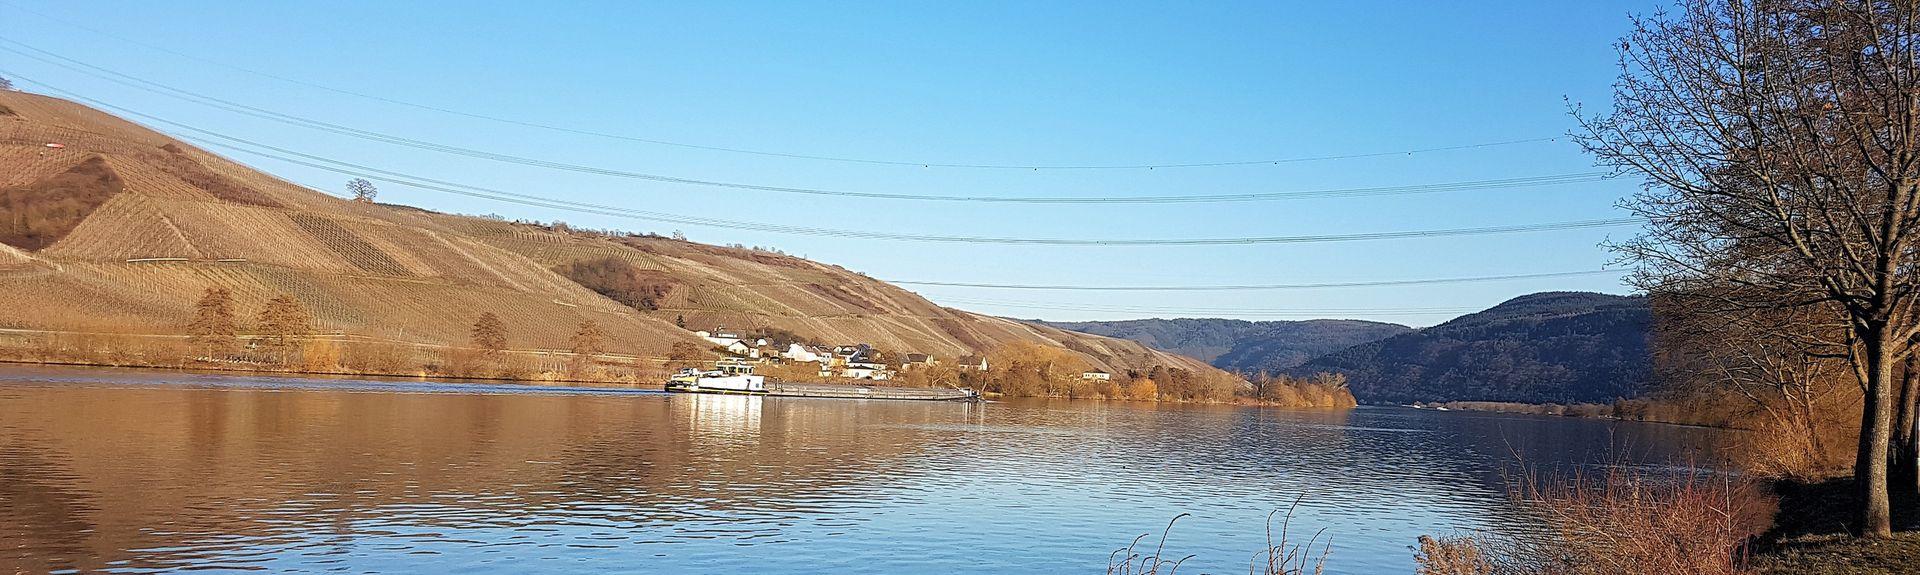 Riveris, Rhineland-Palatinate, Germany